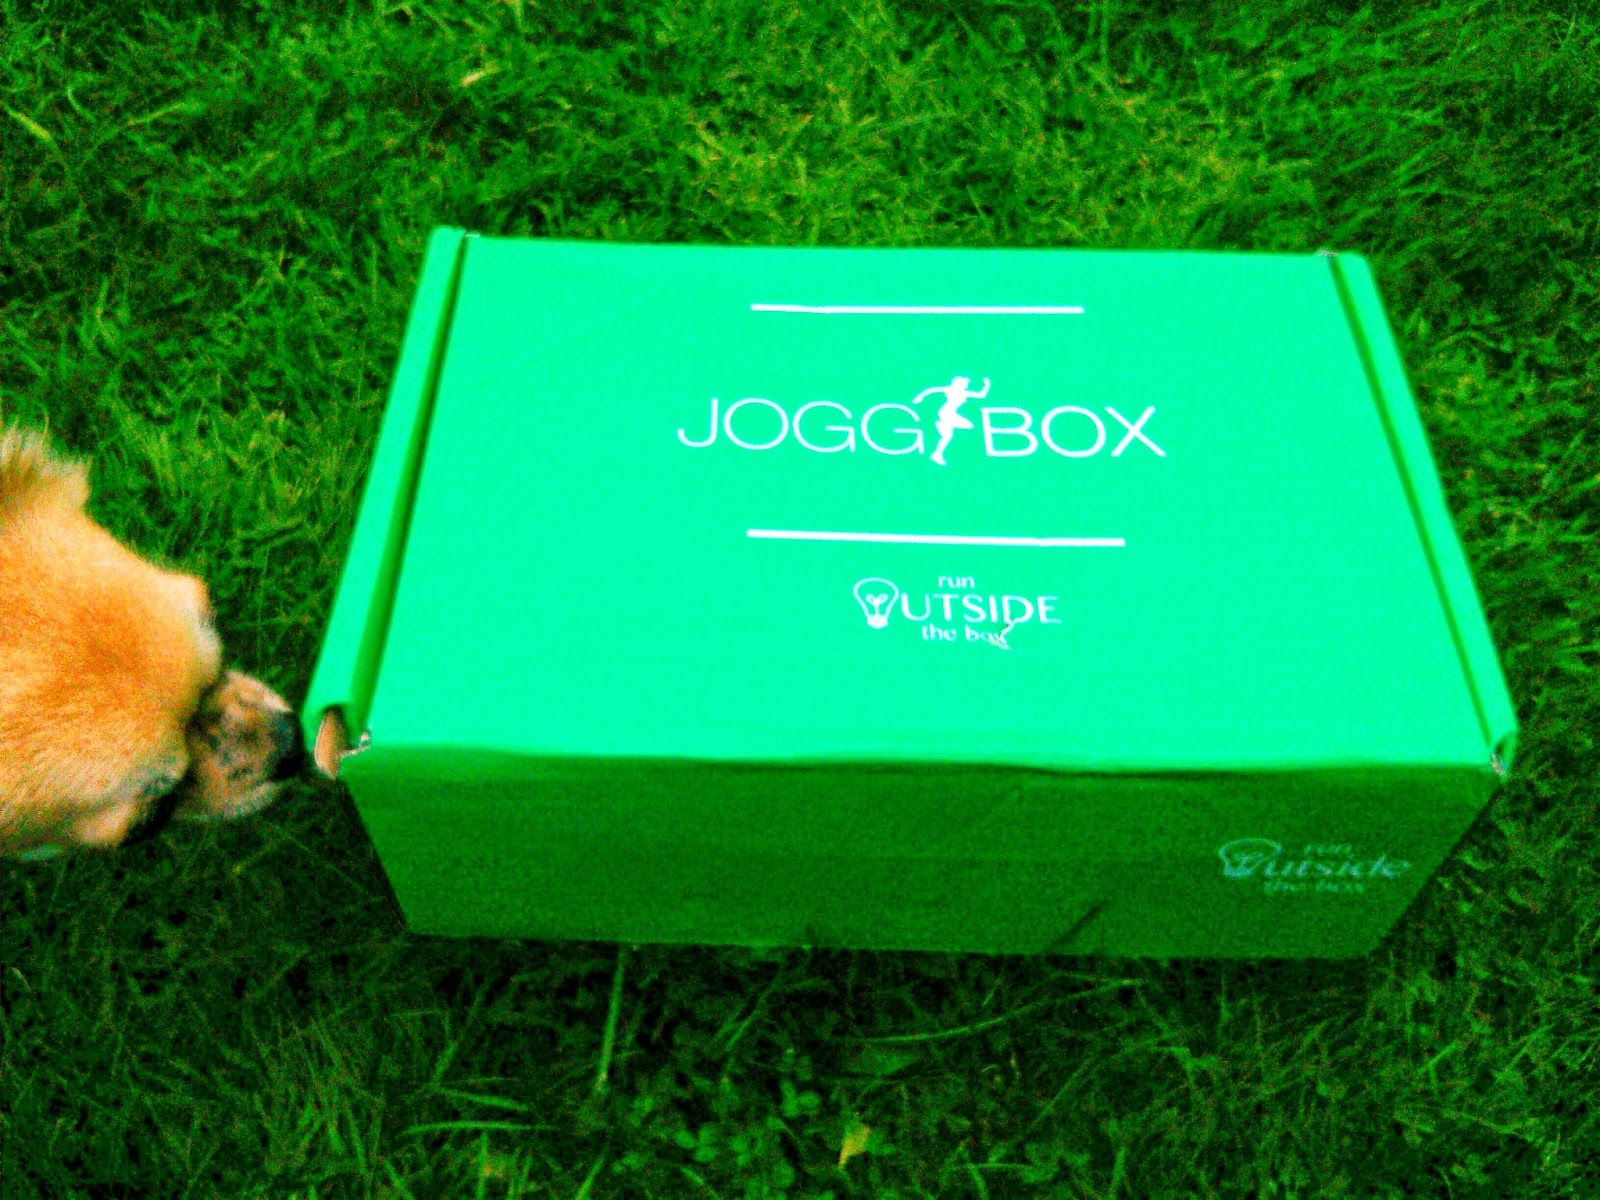 Joggbox